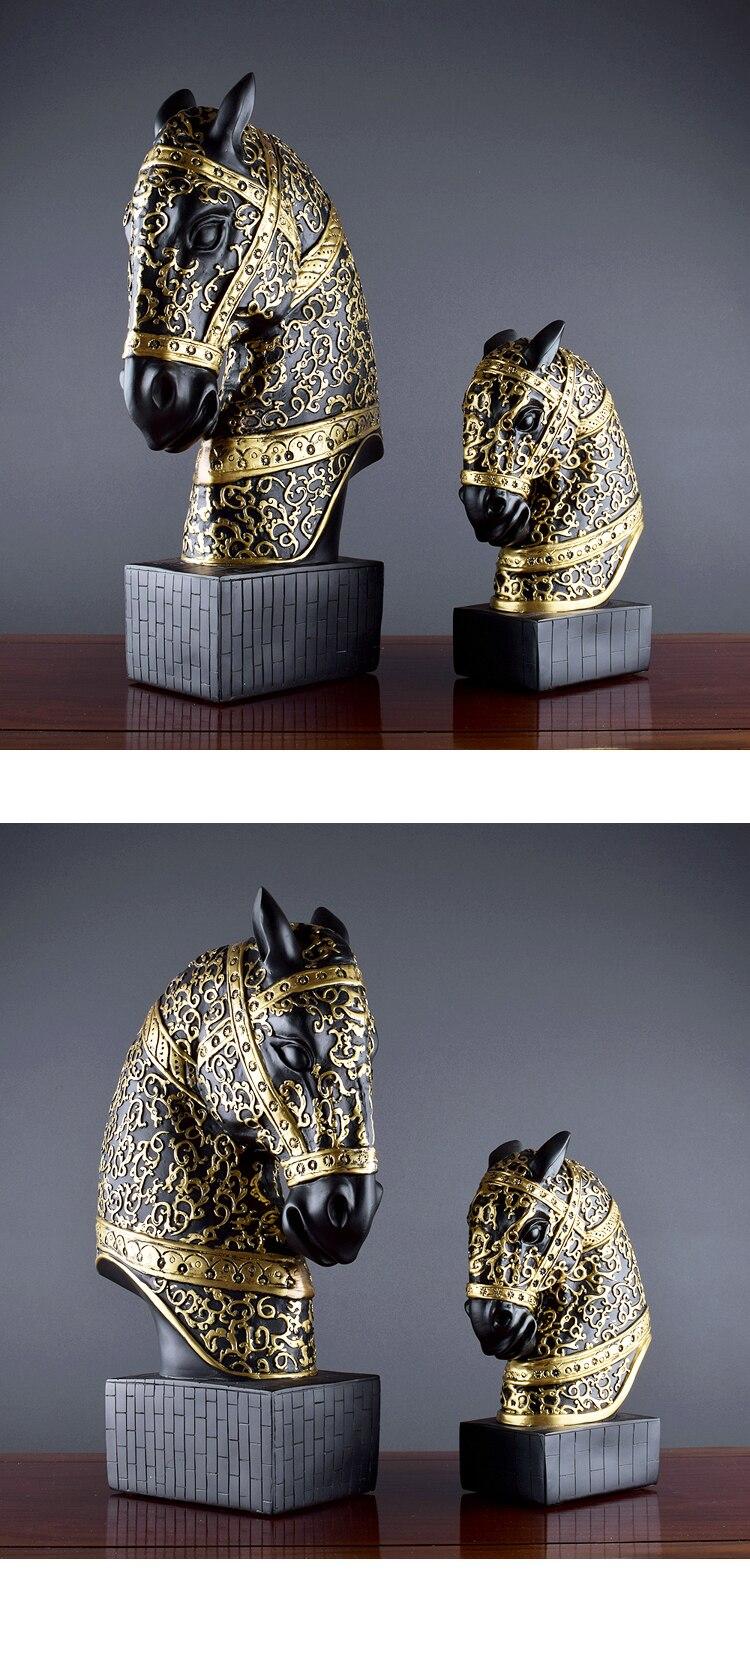 Nordic Vintage Home Decor War Horse Golden Texture Helmet Resin Figure Statue Black Horse Head Adornment Desk Decoration